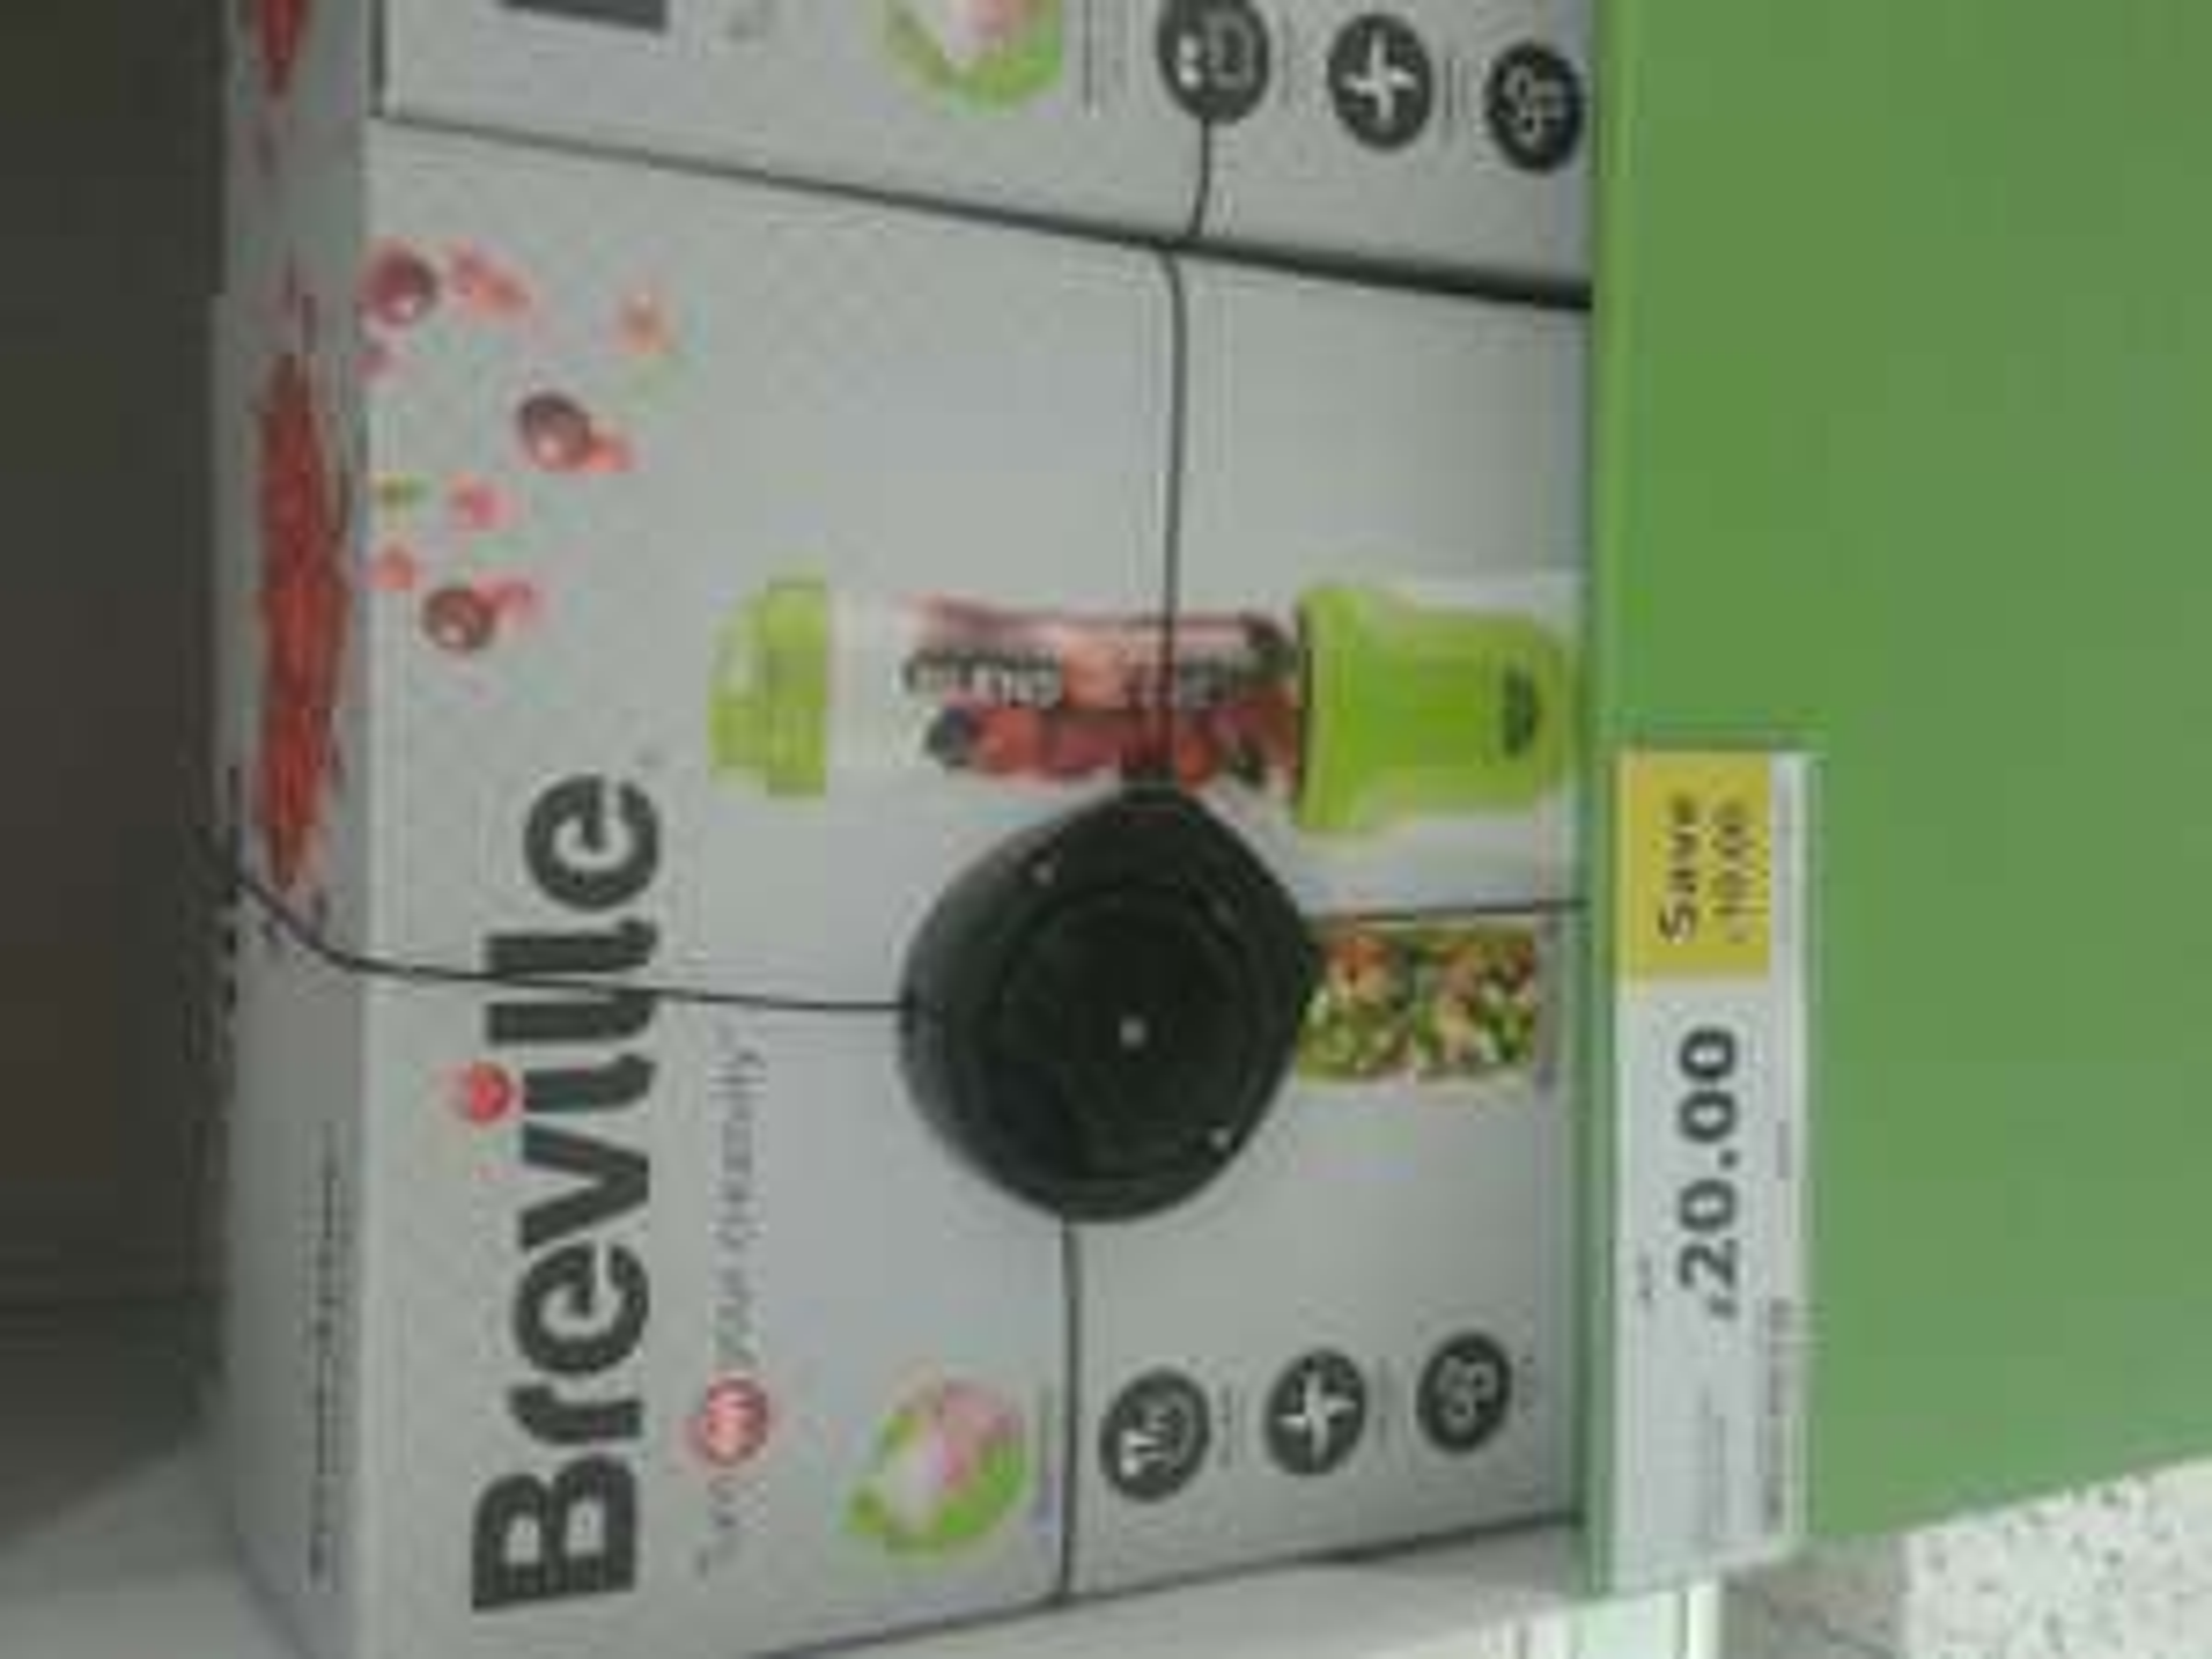 Breville blend active £20 @ Tesco - Perth